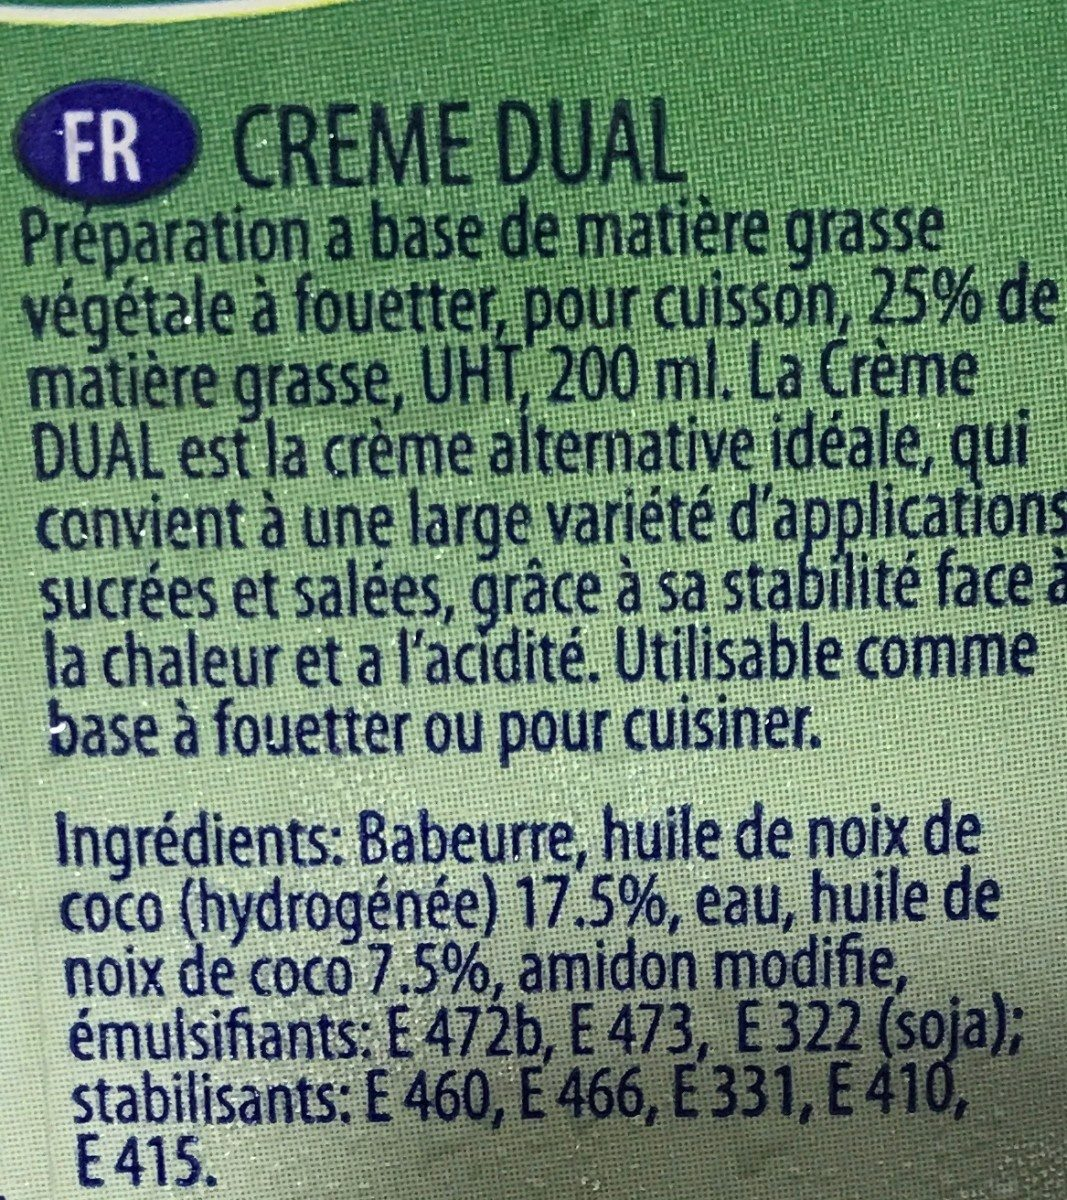 Crème Dual à base végétale - المكونات - fr